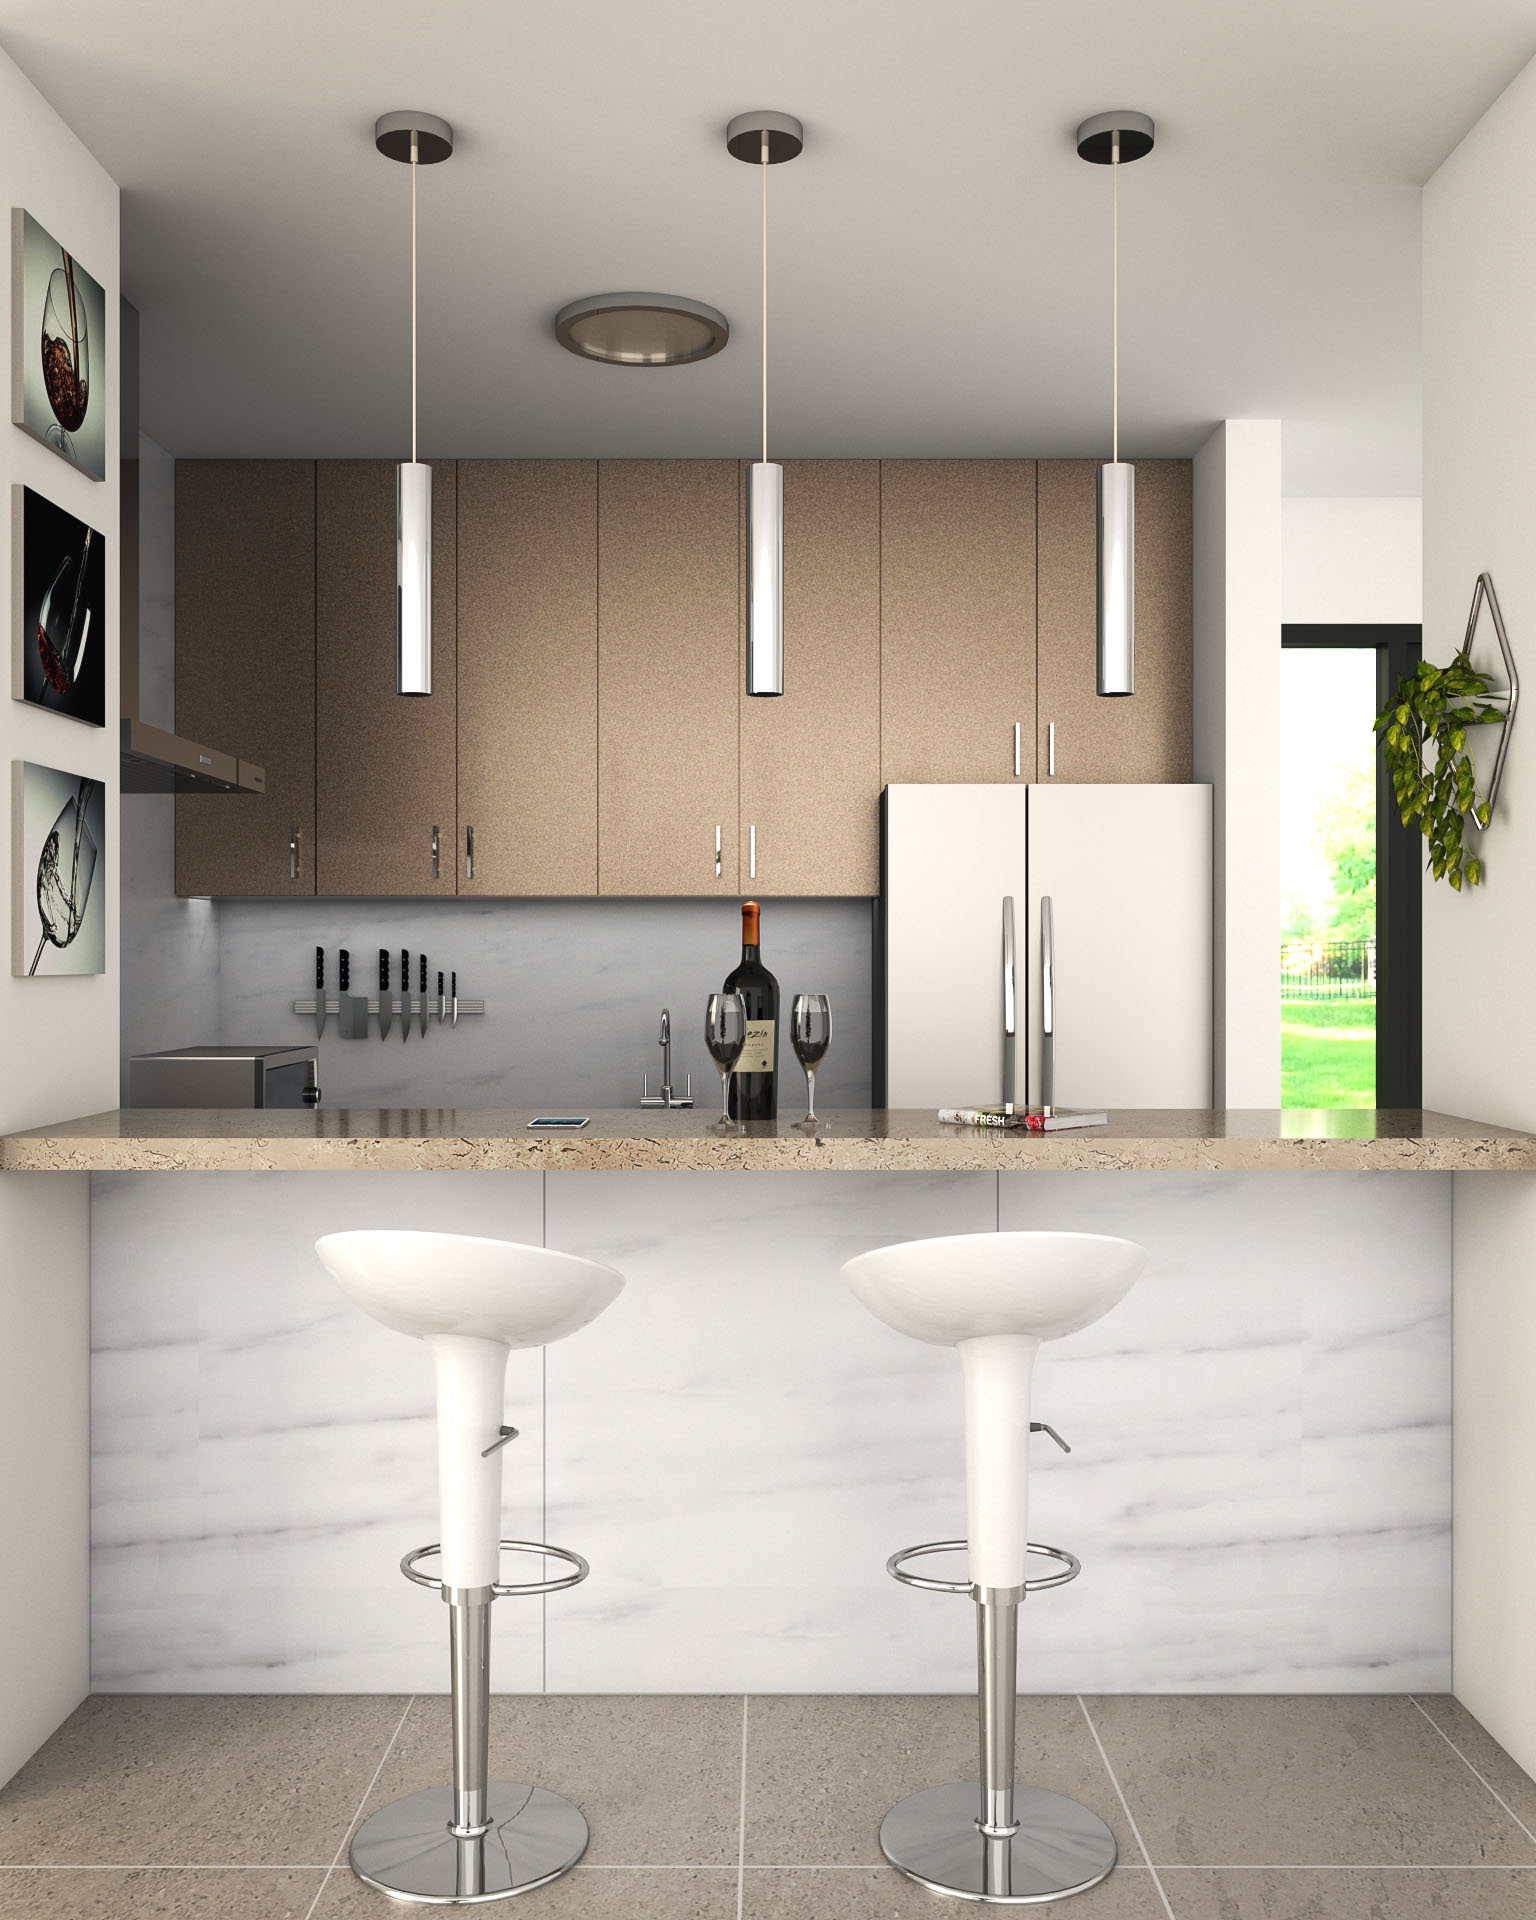 Brown and White kitchen design